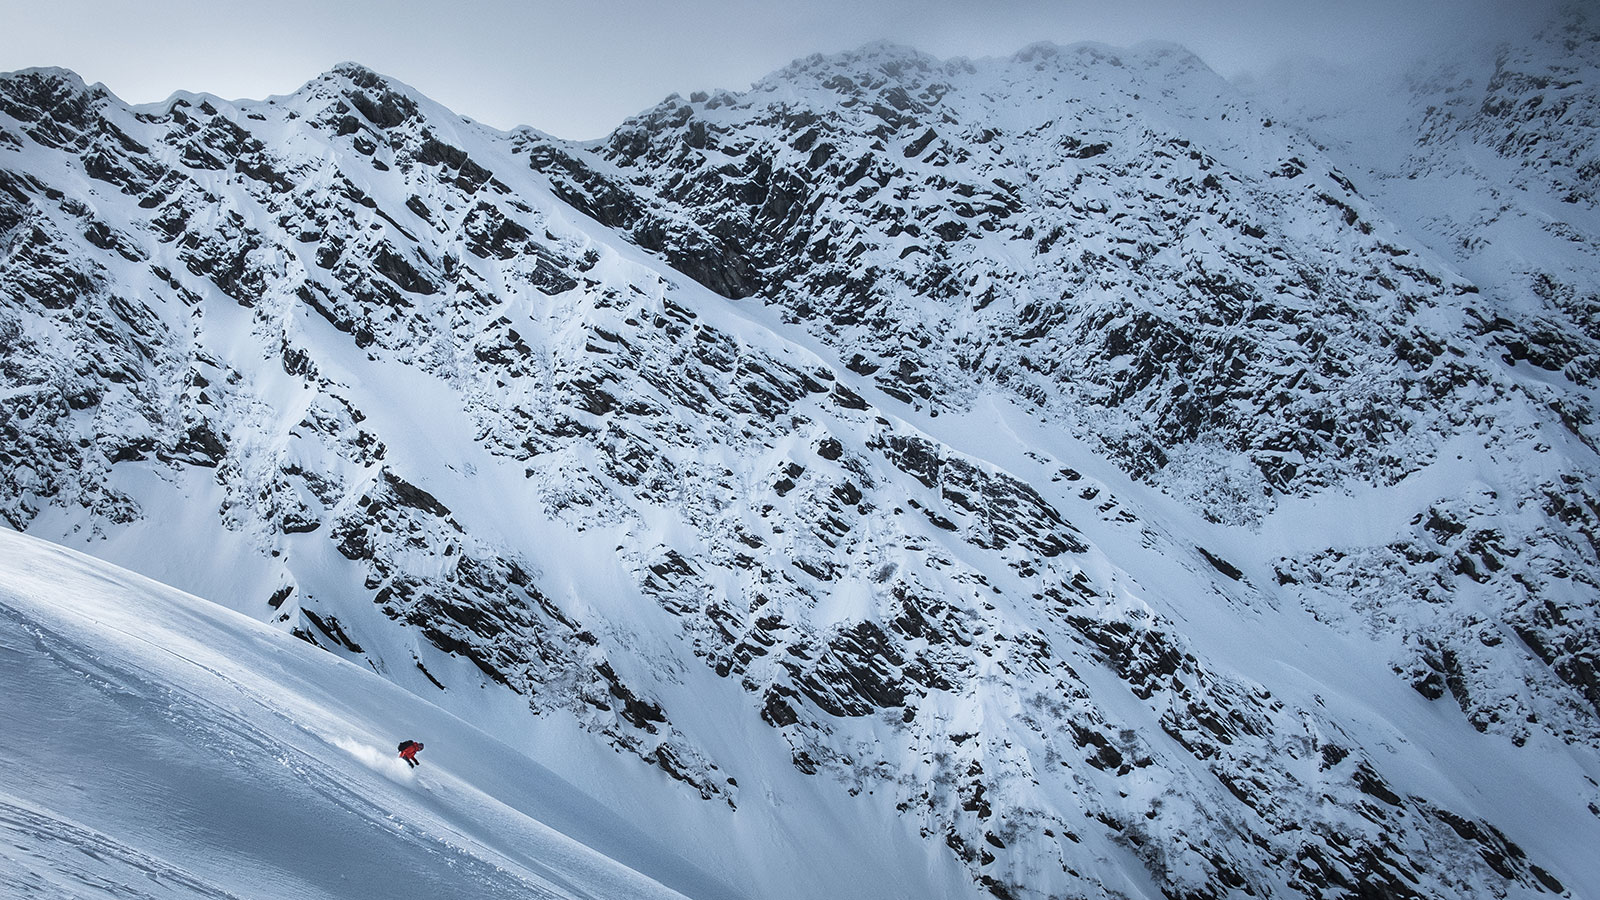 Abwärts. Skitour in Südtirol | Pauli Trenkwalder, Berge & Psychologie